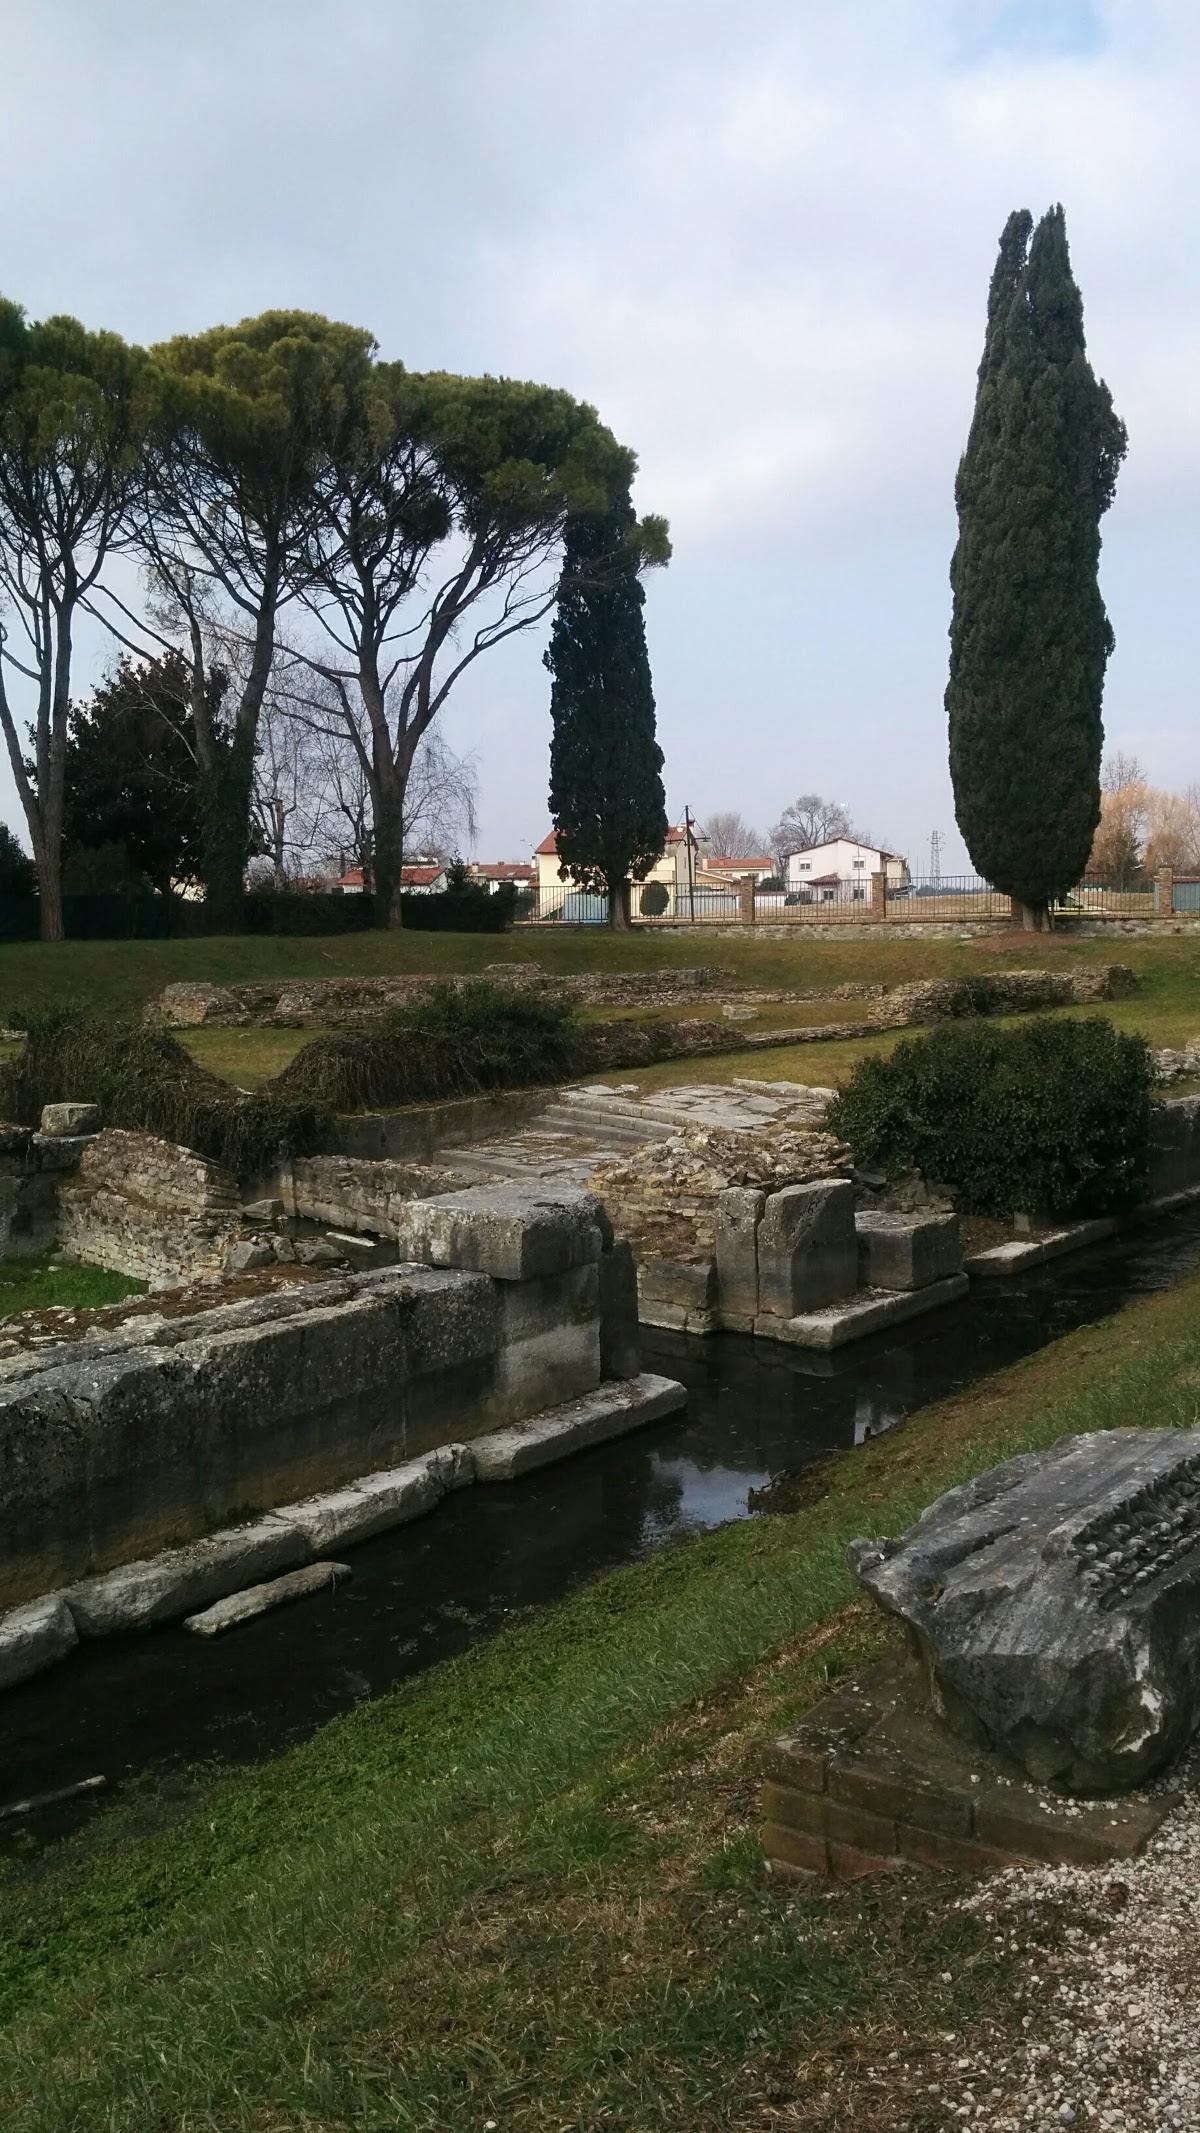 The Roman Port River of Aquileia